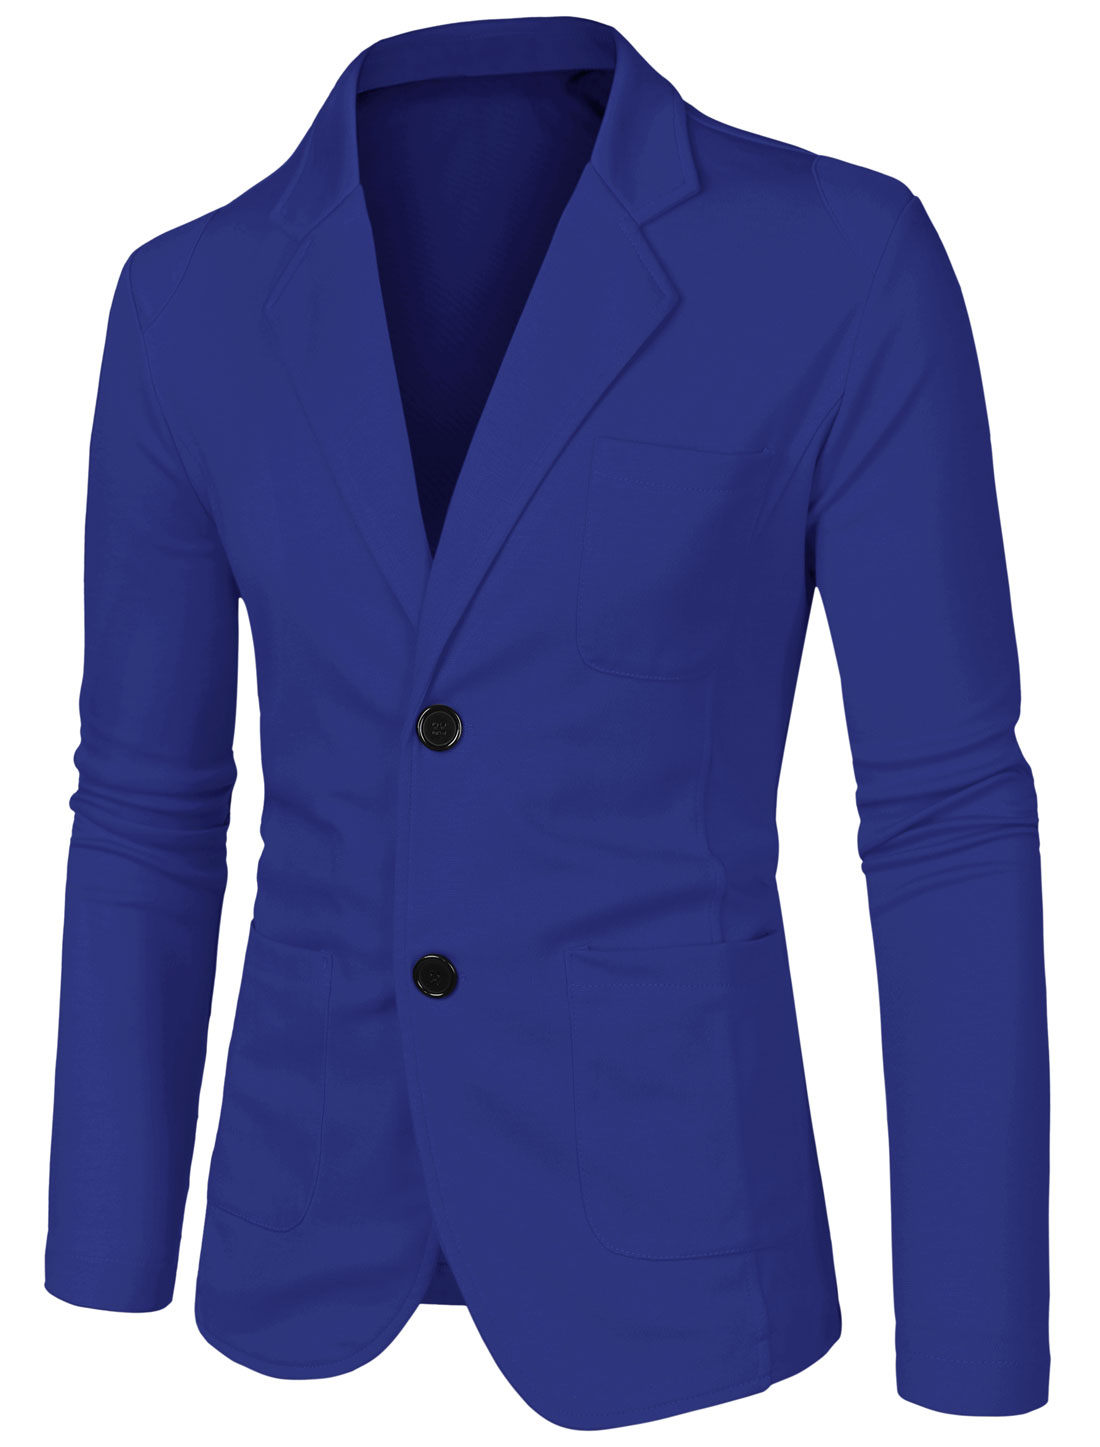 Men Notched Lapel Solid Color Long Sleeve Knit Blazer Royal Blue 36